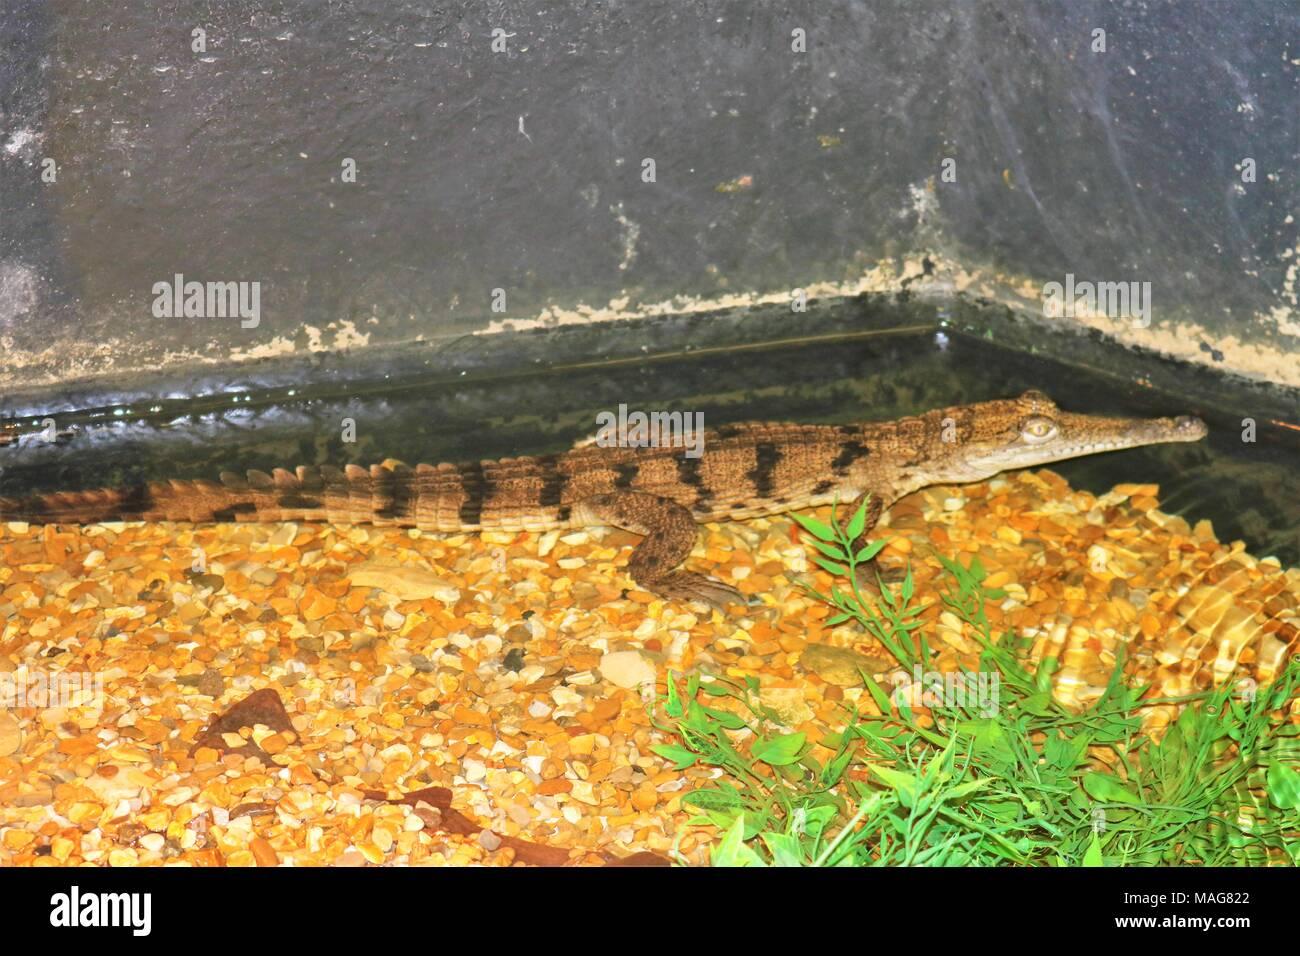 Small alligator / crocodile in water at tourist attraction - Stock Image